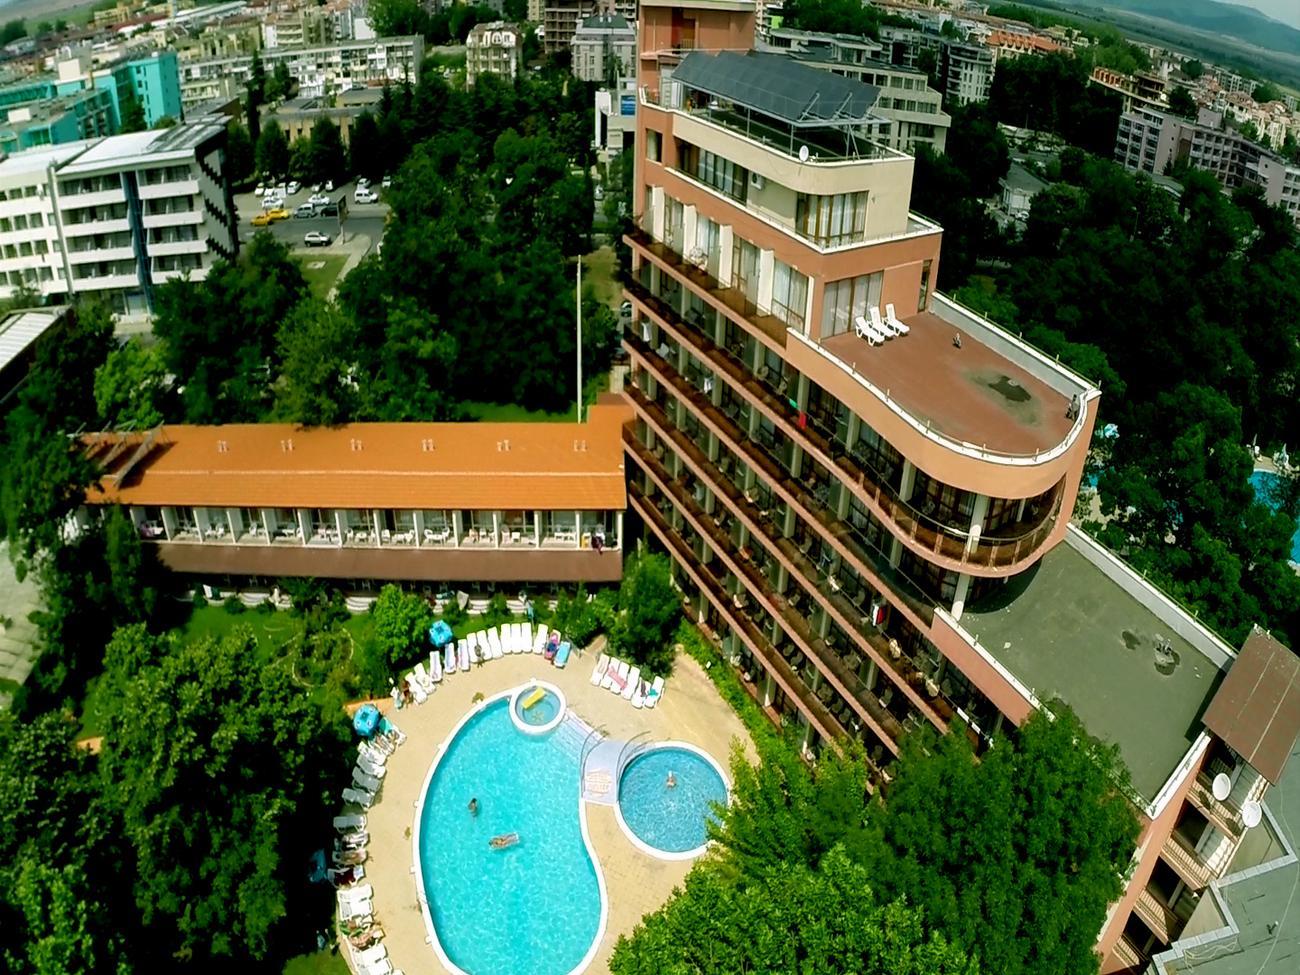 planet jupiter hotel - photo #43